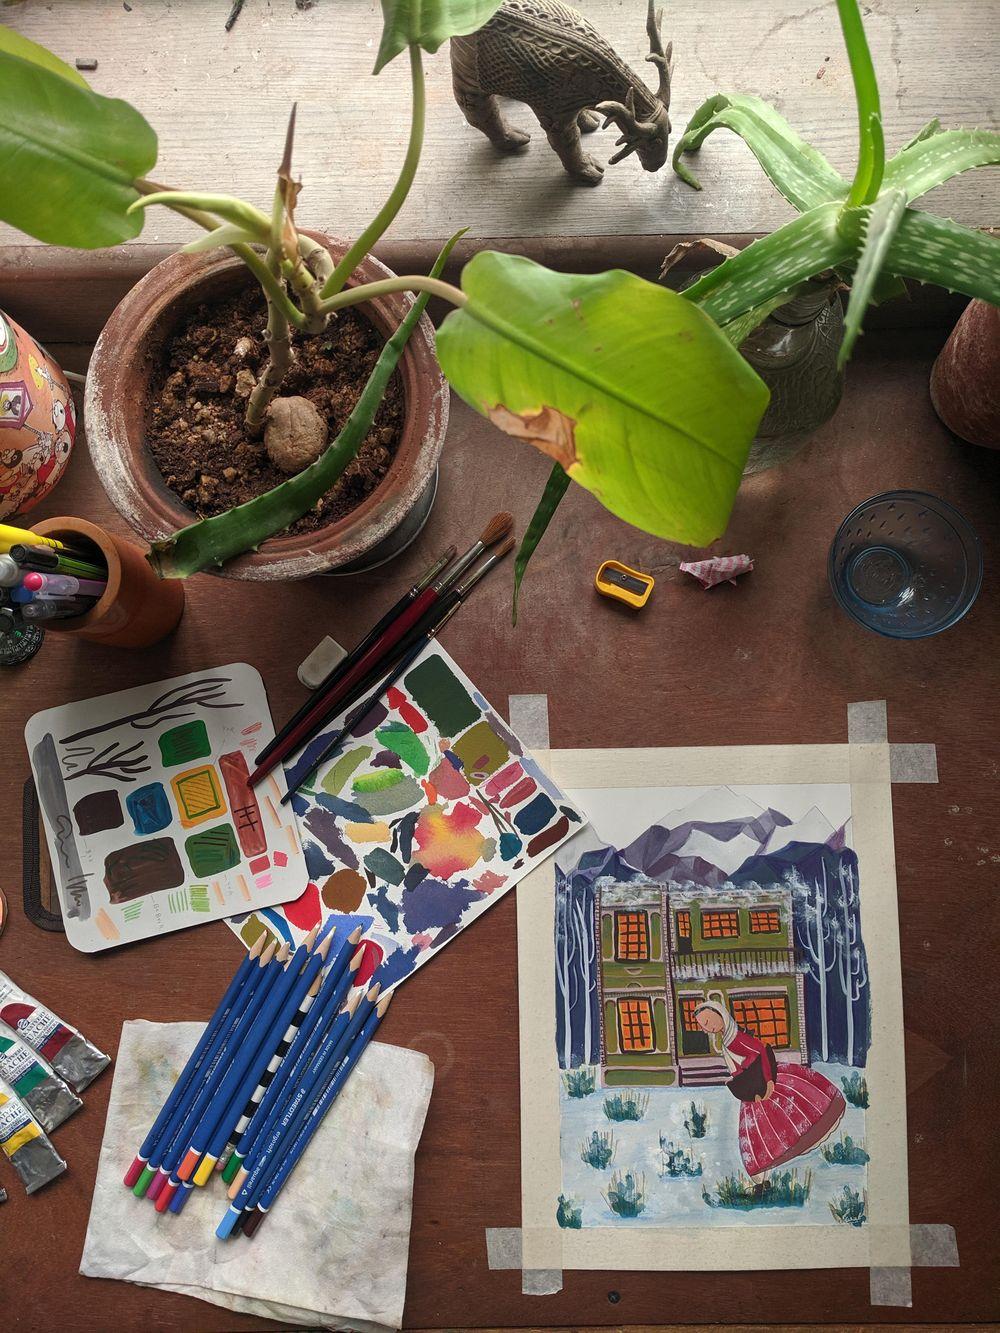 Azen of Ladakh - image 3 - student project